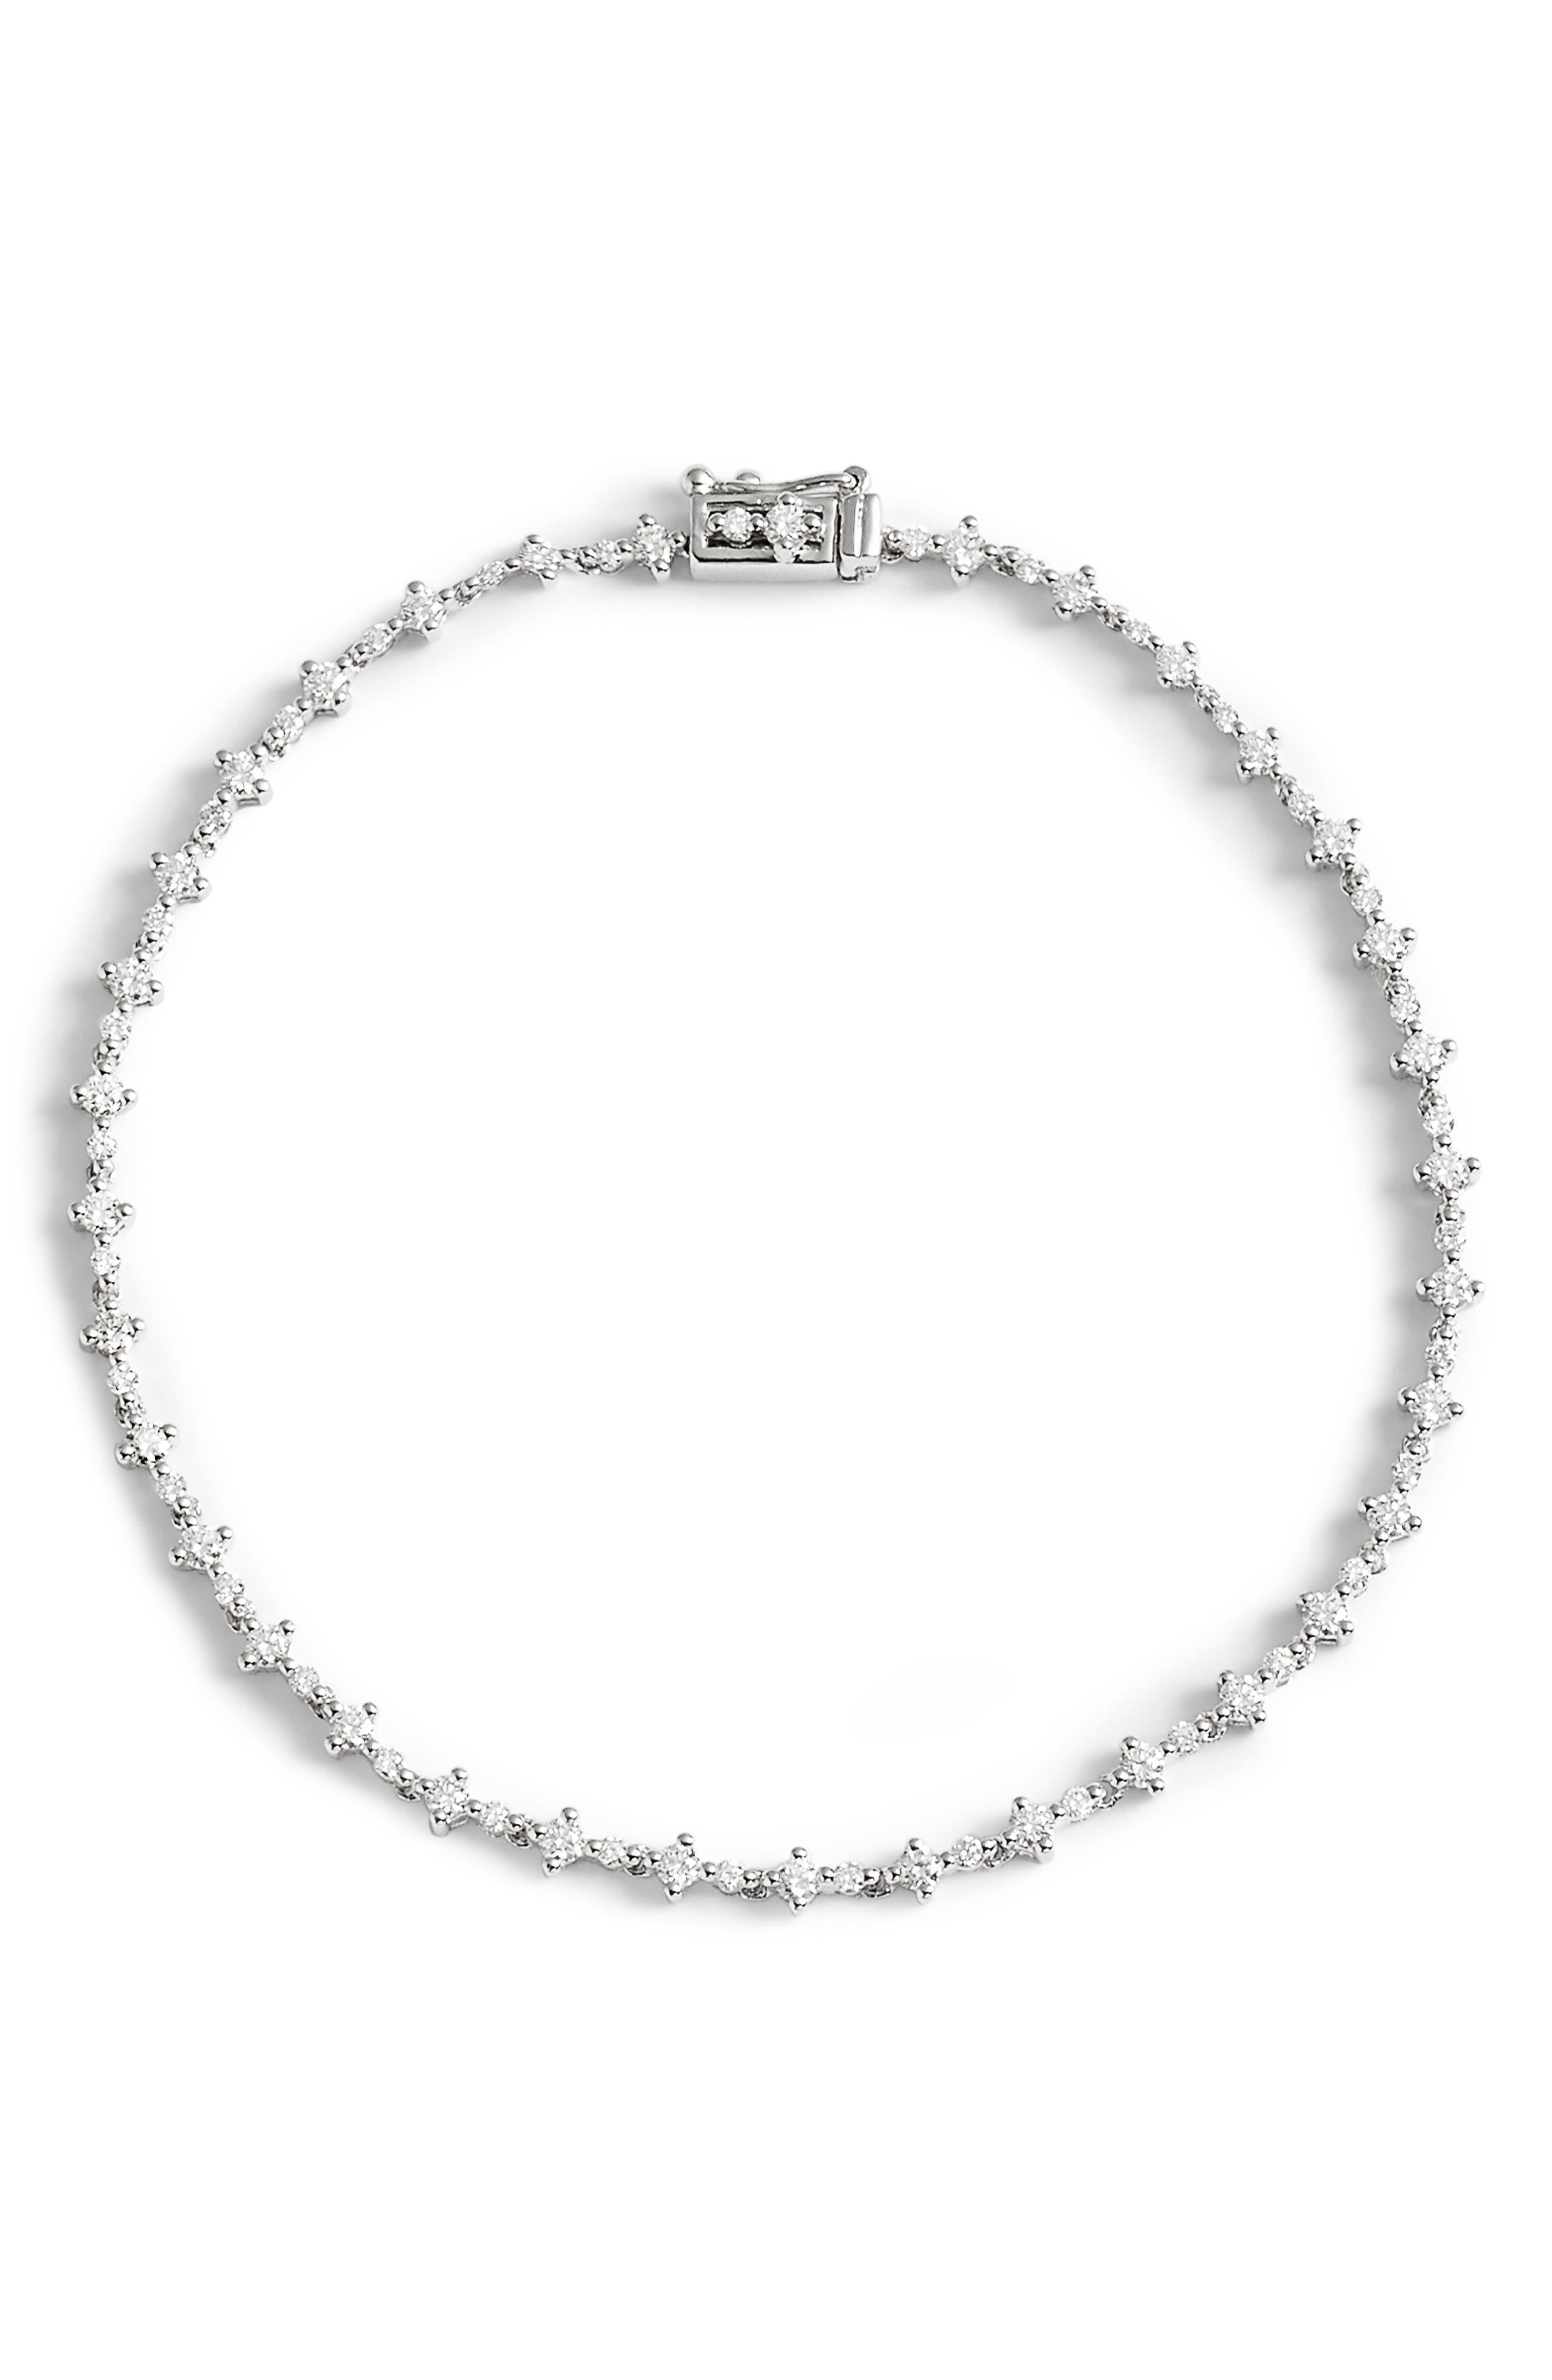 Botanical Diamond Tennis Bracelet,                             Main thumbnail 1, color,                             WHITE GOLD